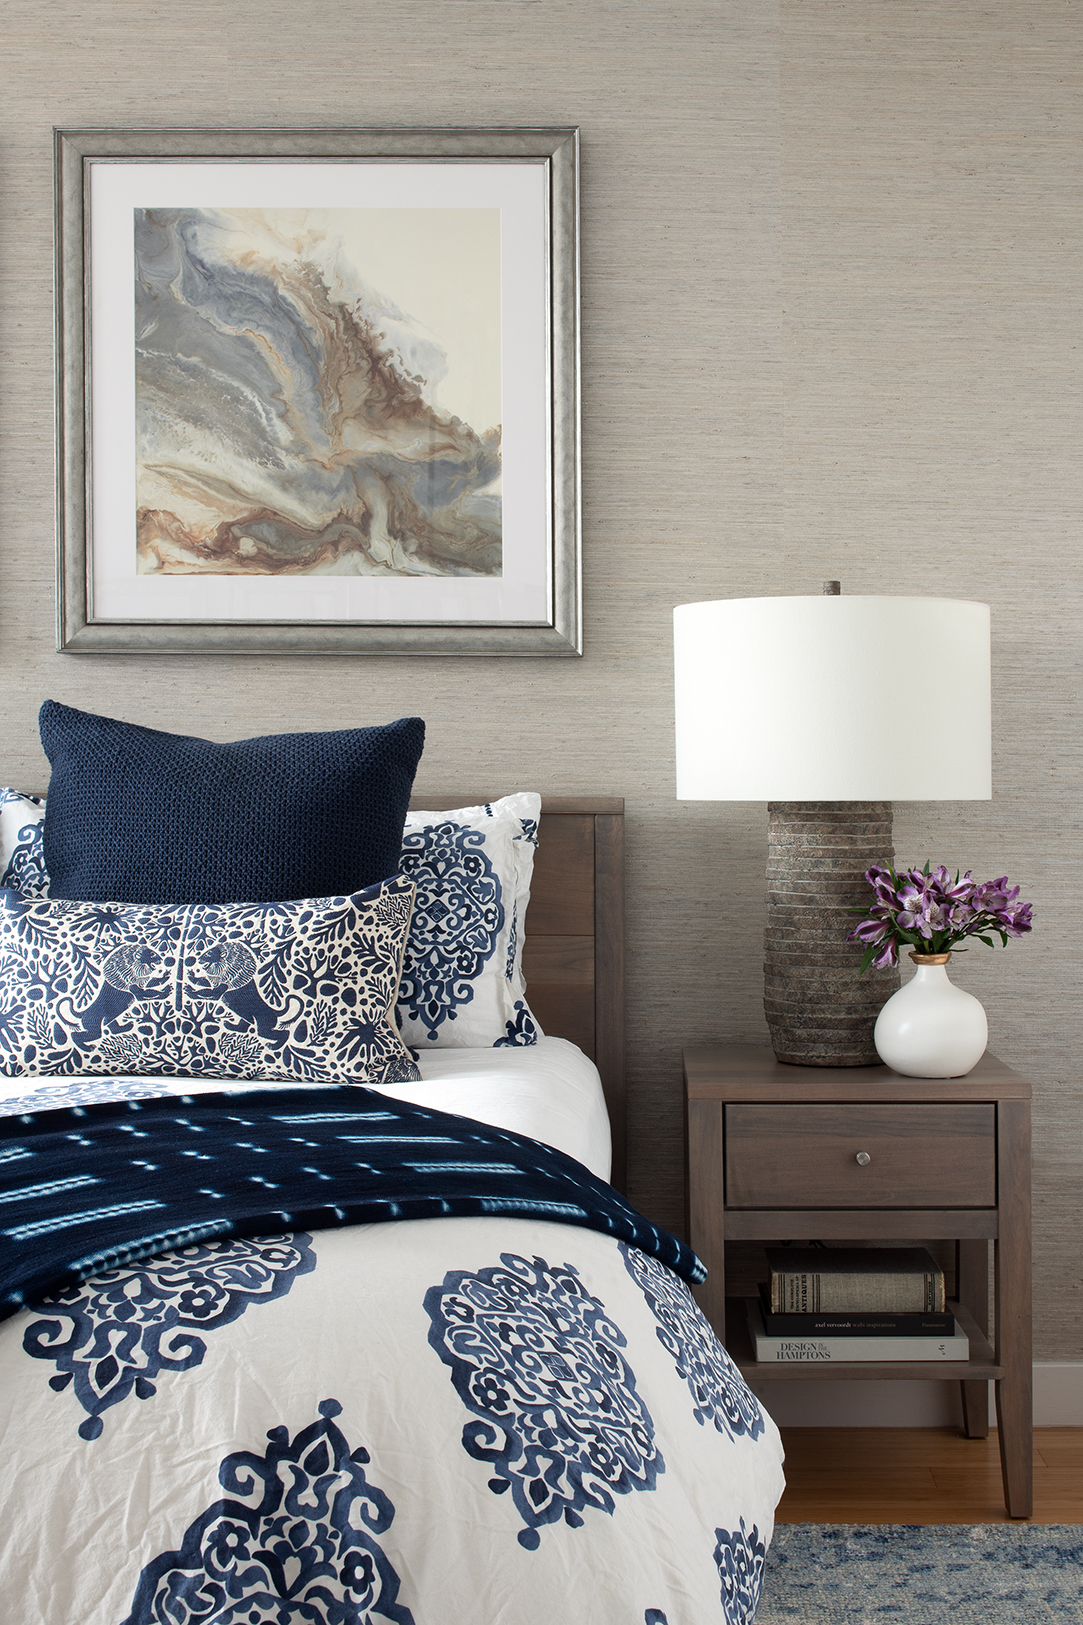 river_bedroom_vignette.jpg